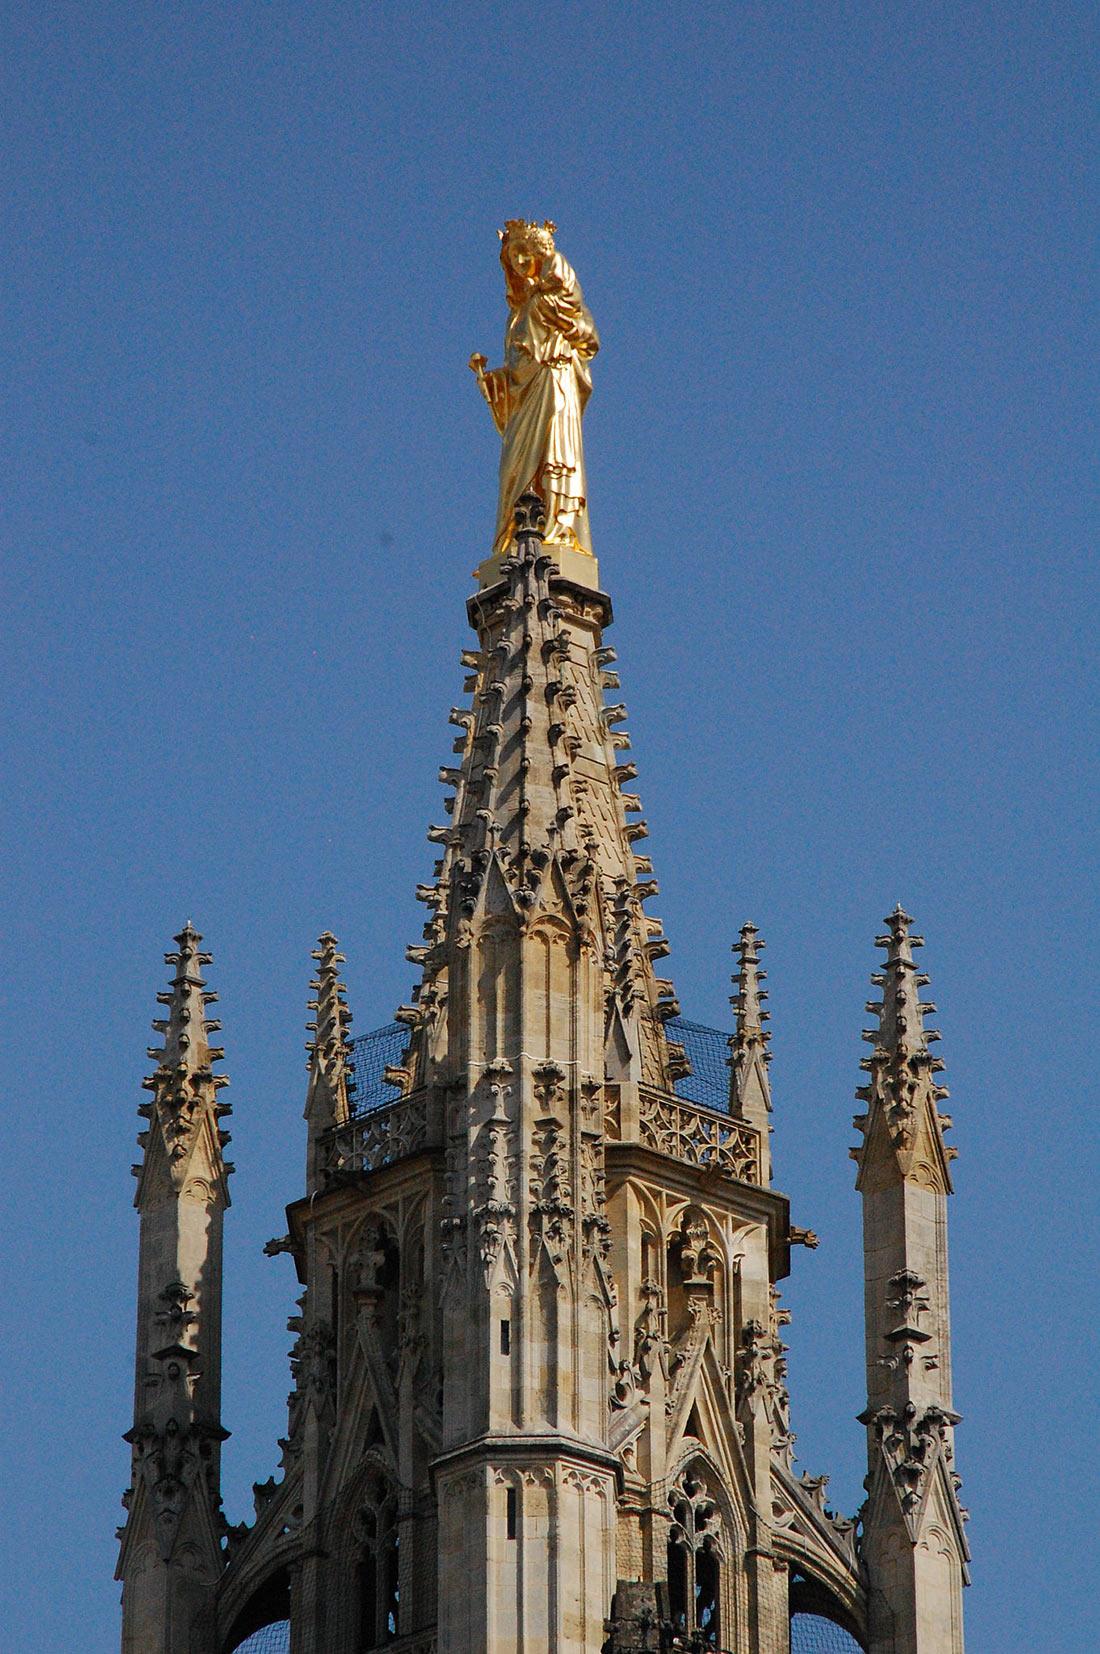 Башня Пей Берланд